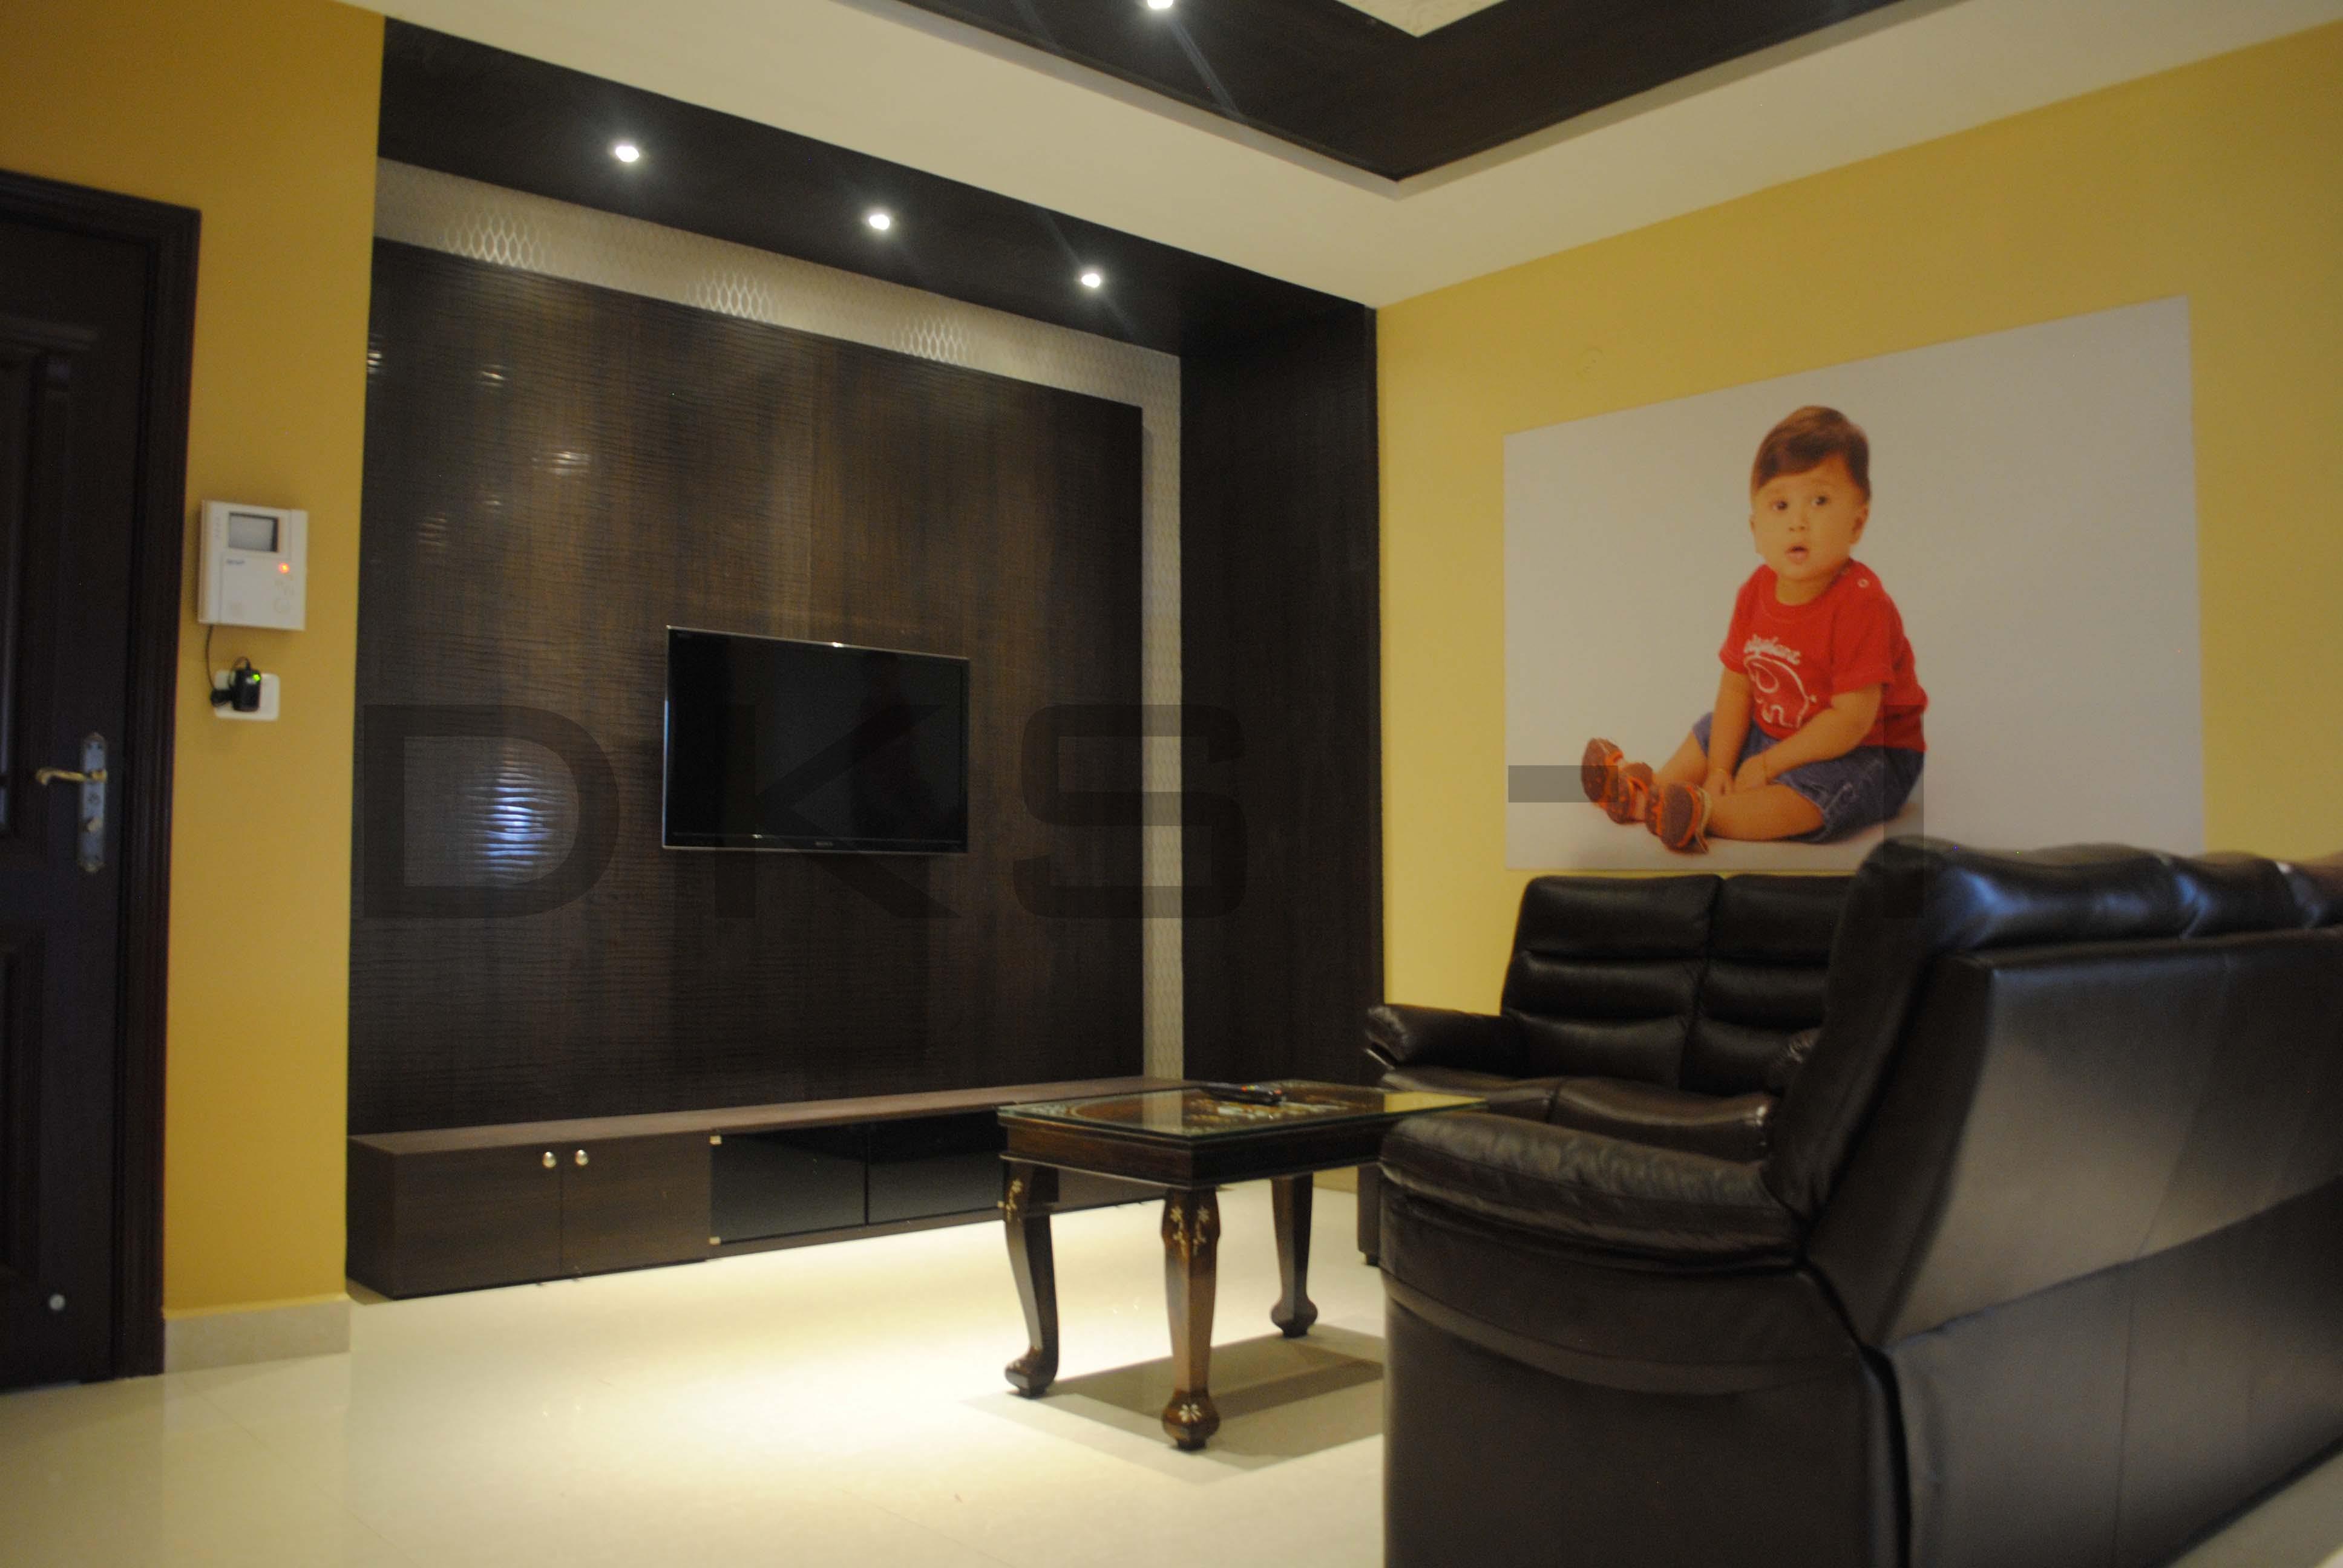 Interior design job vacancies in chennai for Room decor job